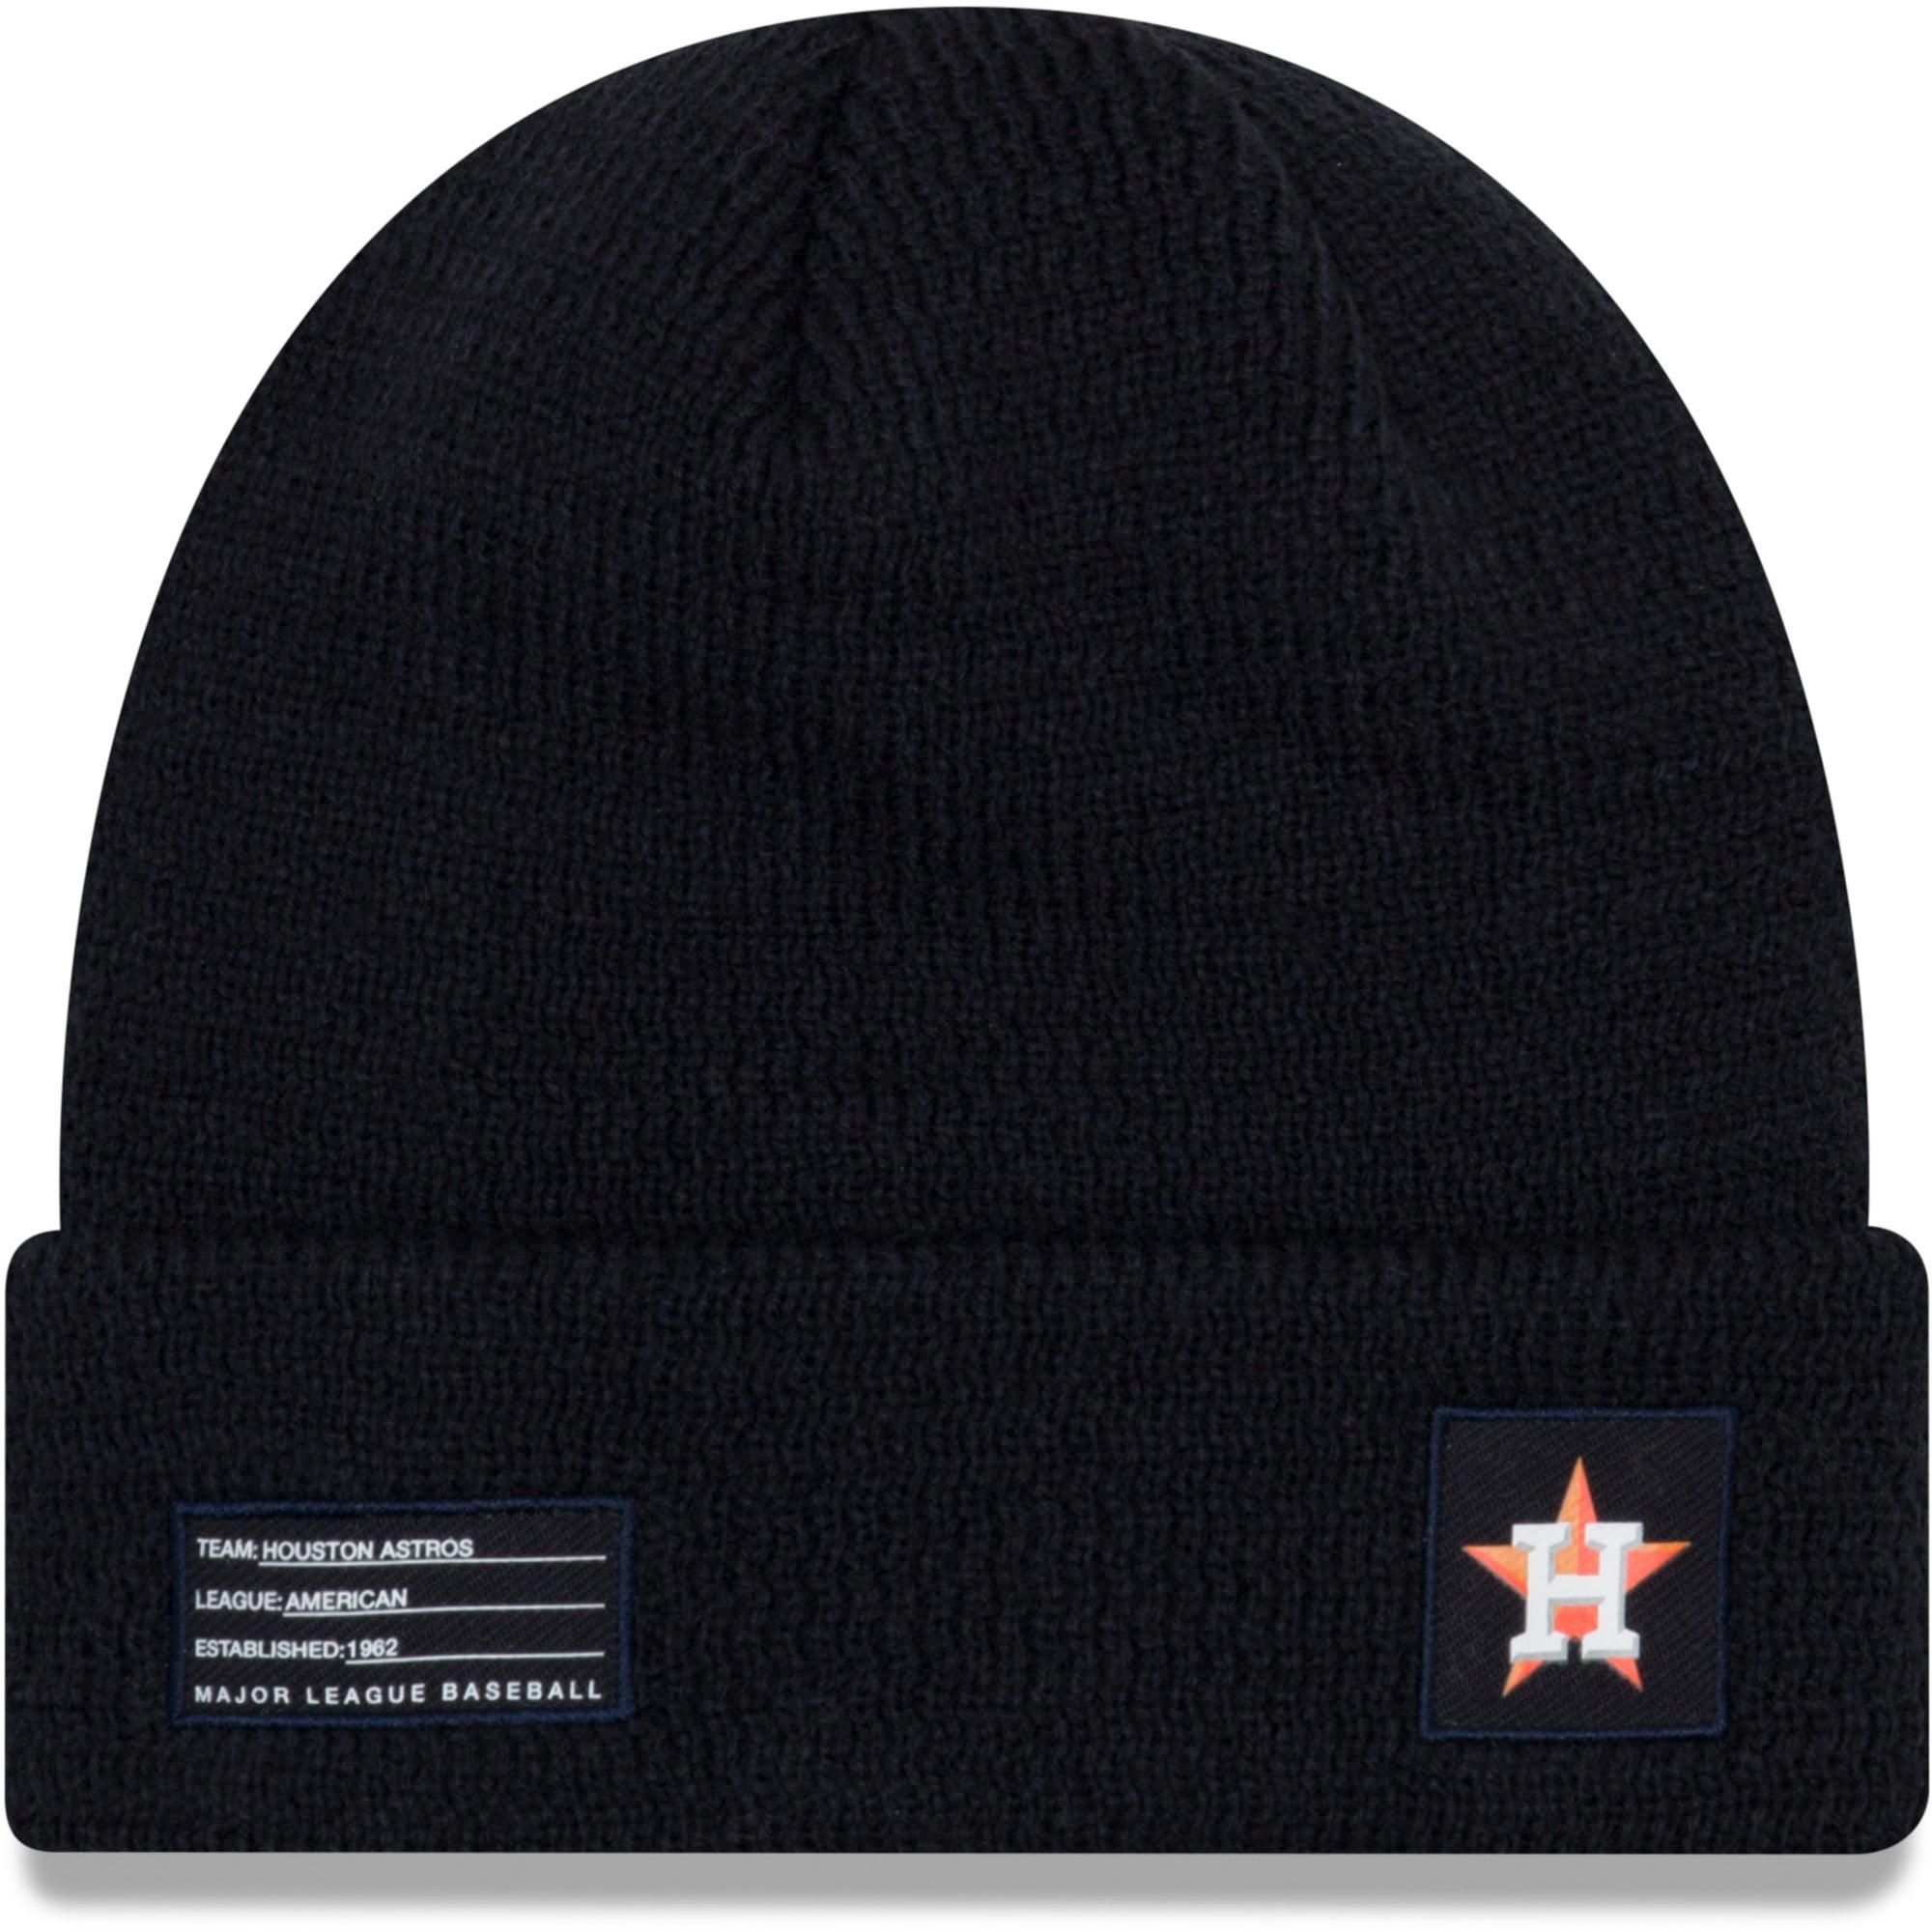 Houston Astros New Era On-Field Sport Cuffed Knit Hat - Navy - OSFA